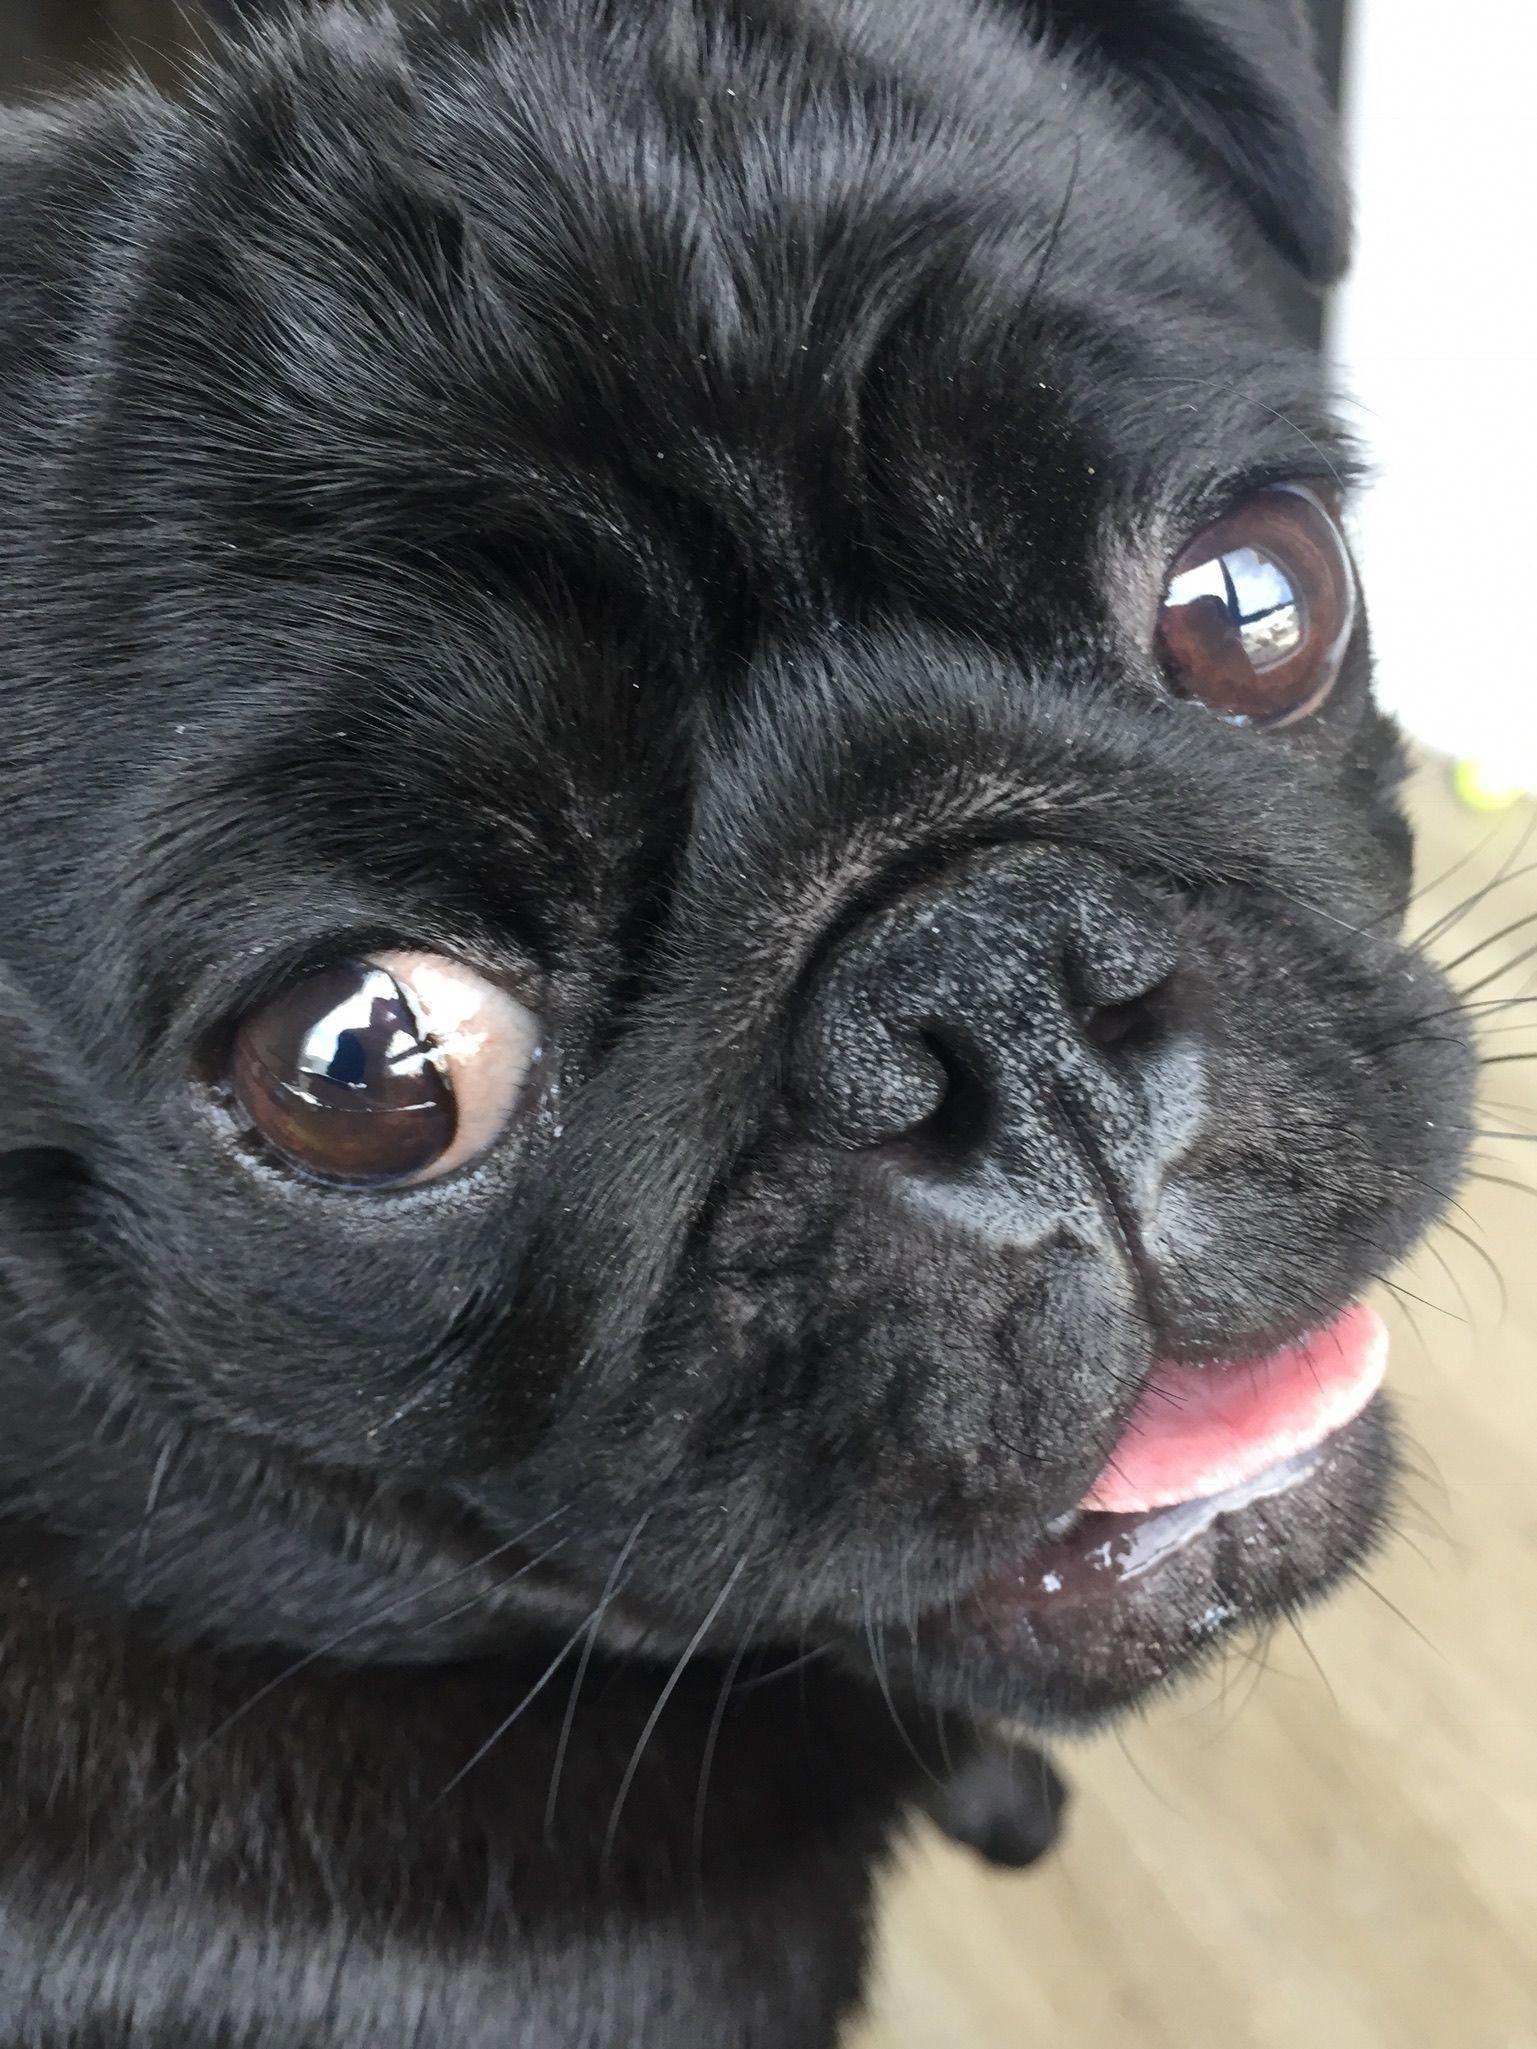 Baby Pug Dog Price In Chennai Black Pug Puppies Cute Pugs Baby Pug Dog